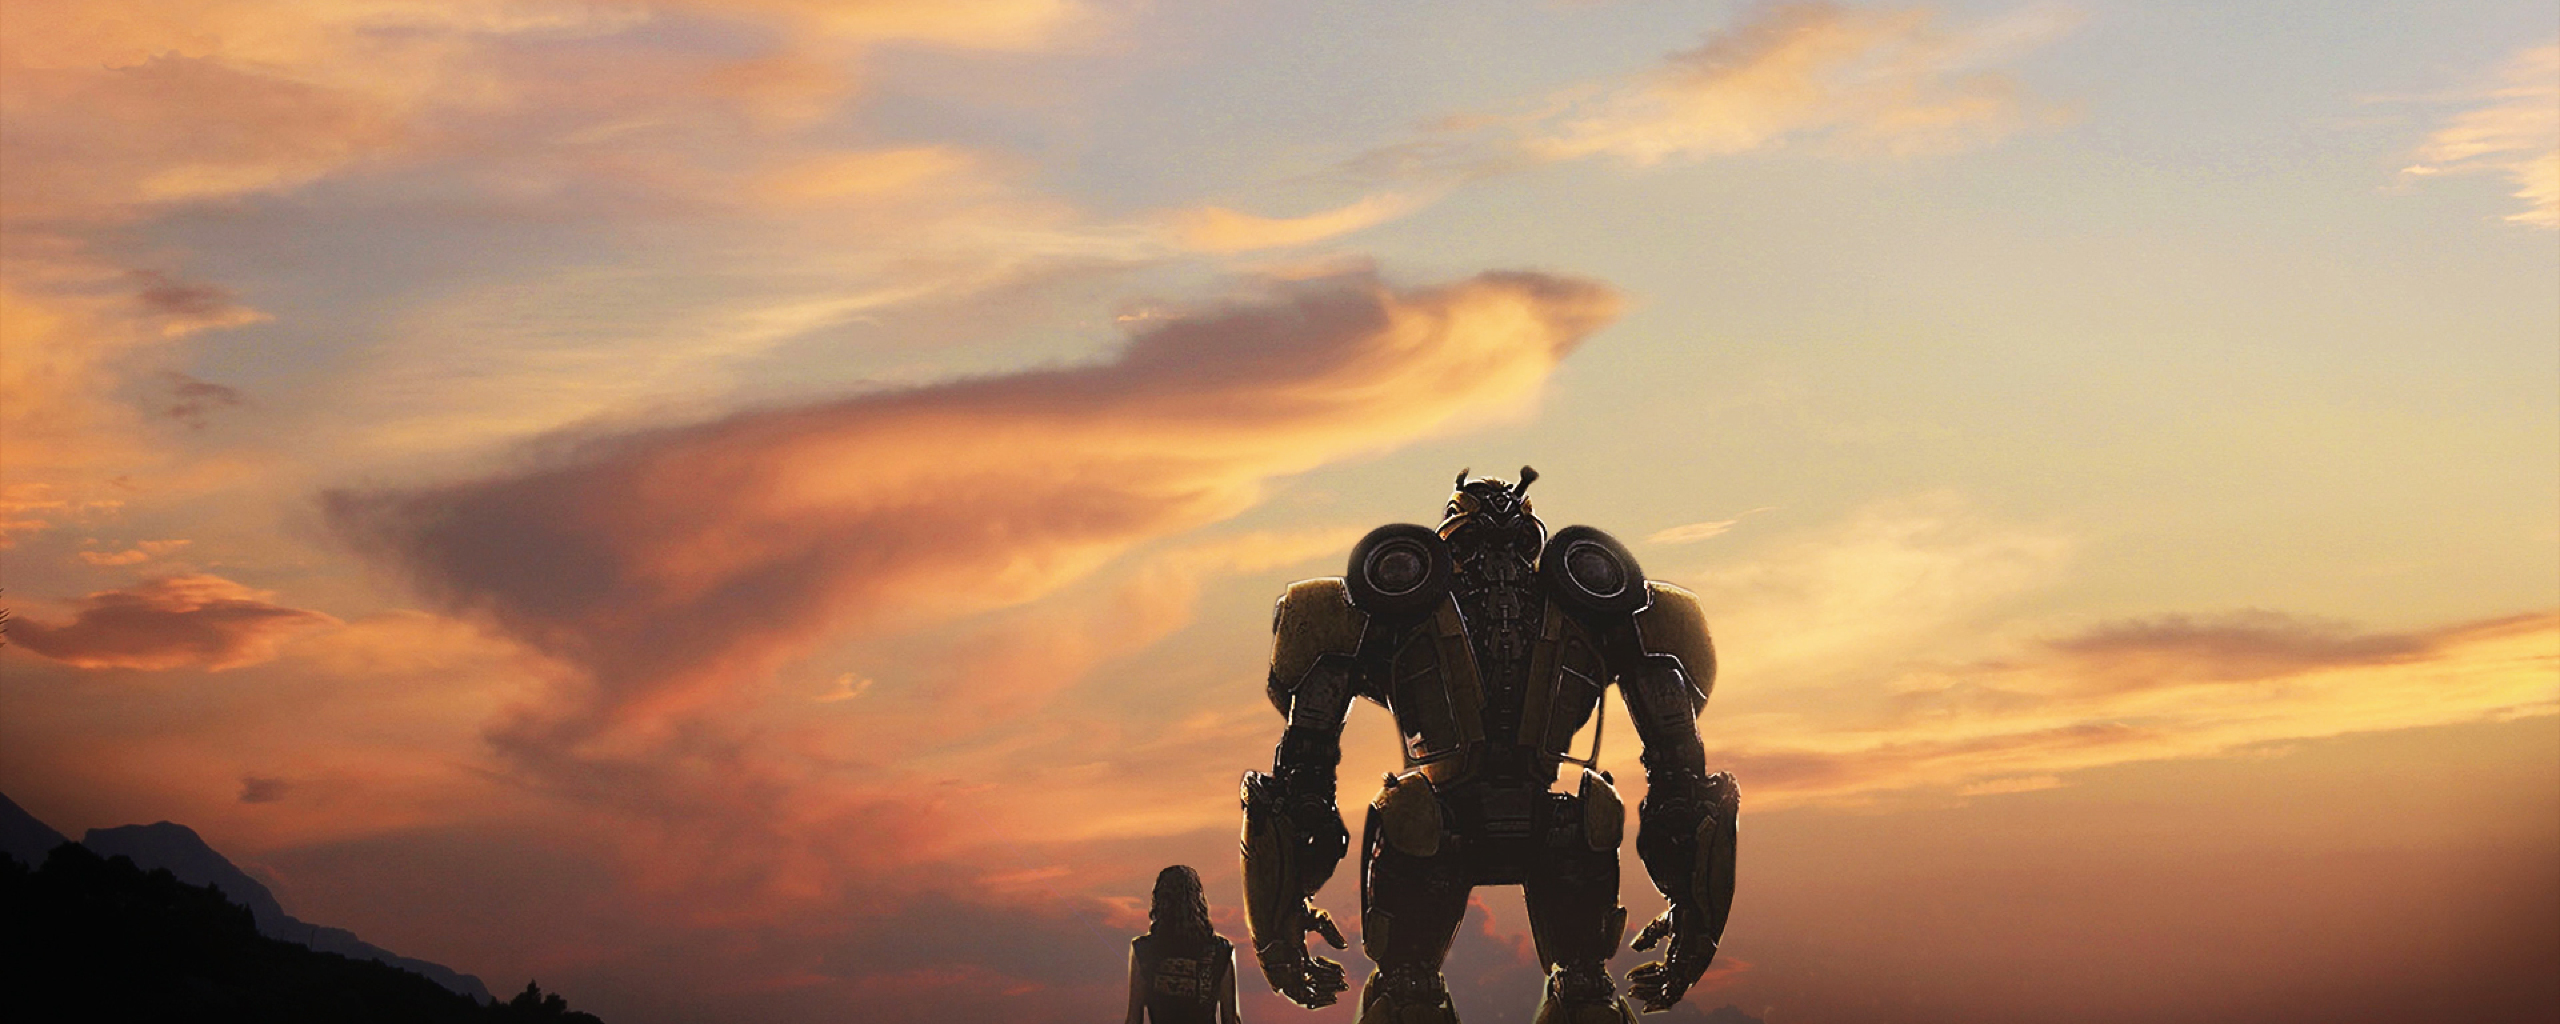 Download transformer bumblebee movie poster artwork - Movie poster wallpaper ...